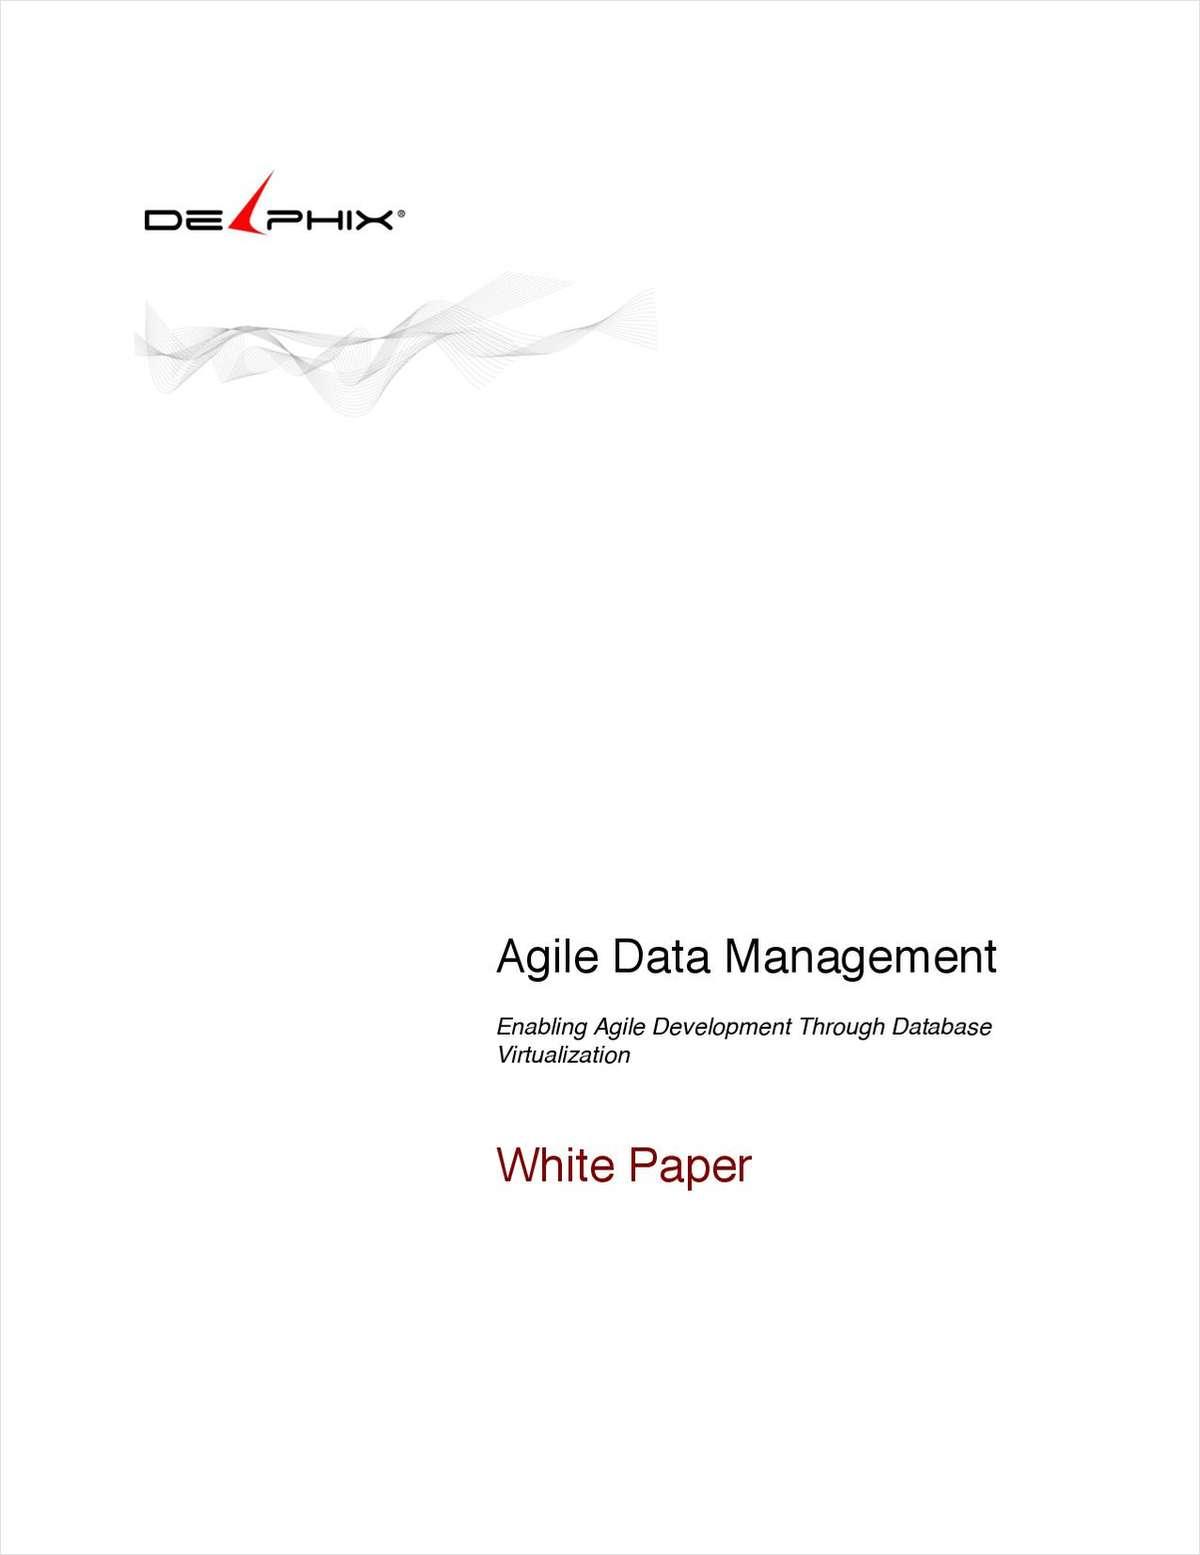 Agile Data Management: Enabling Agile Development Through Database Virtualization